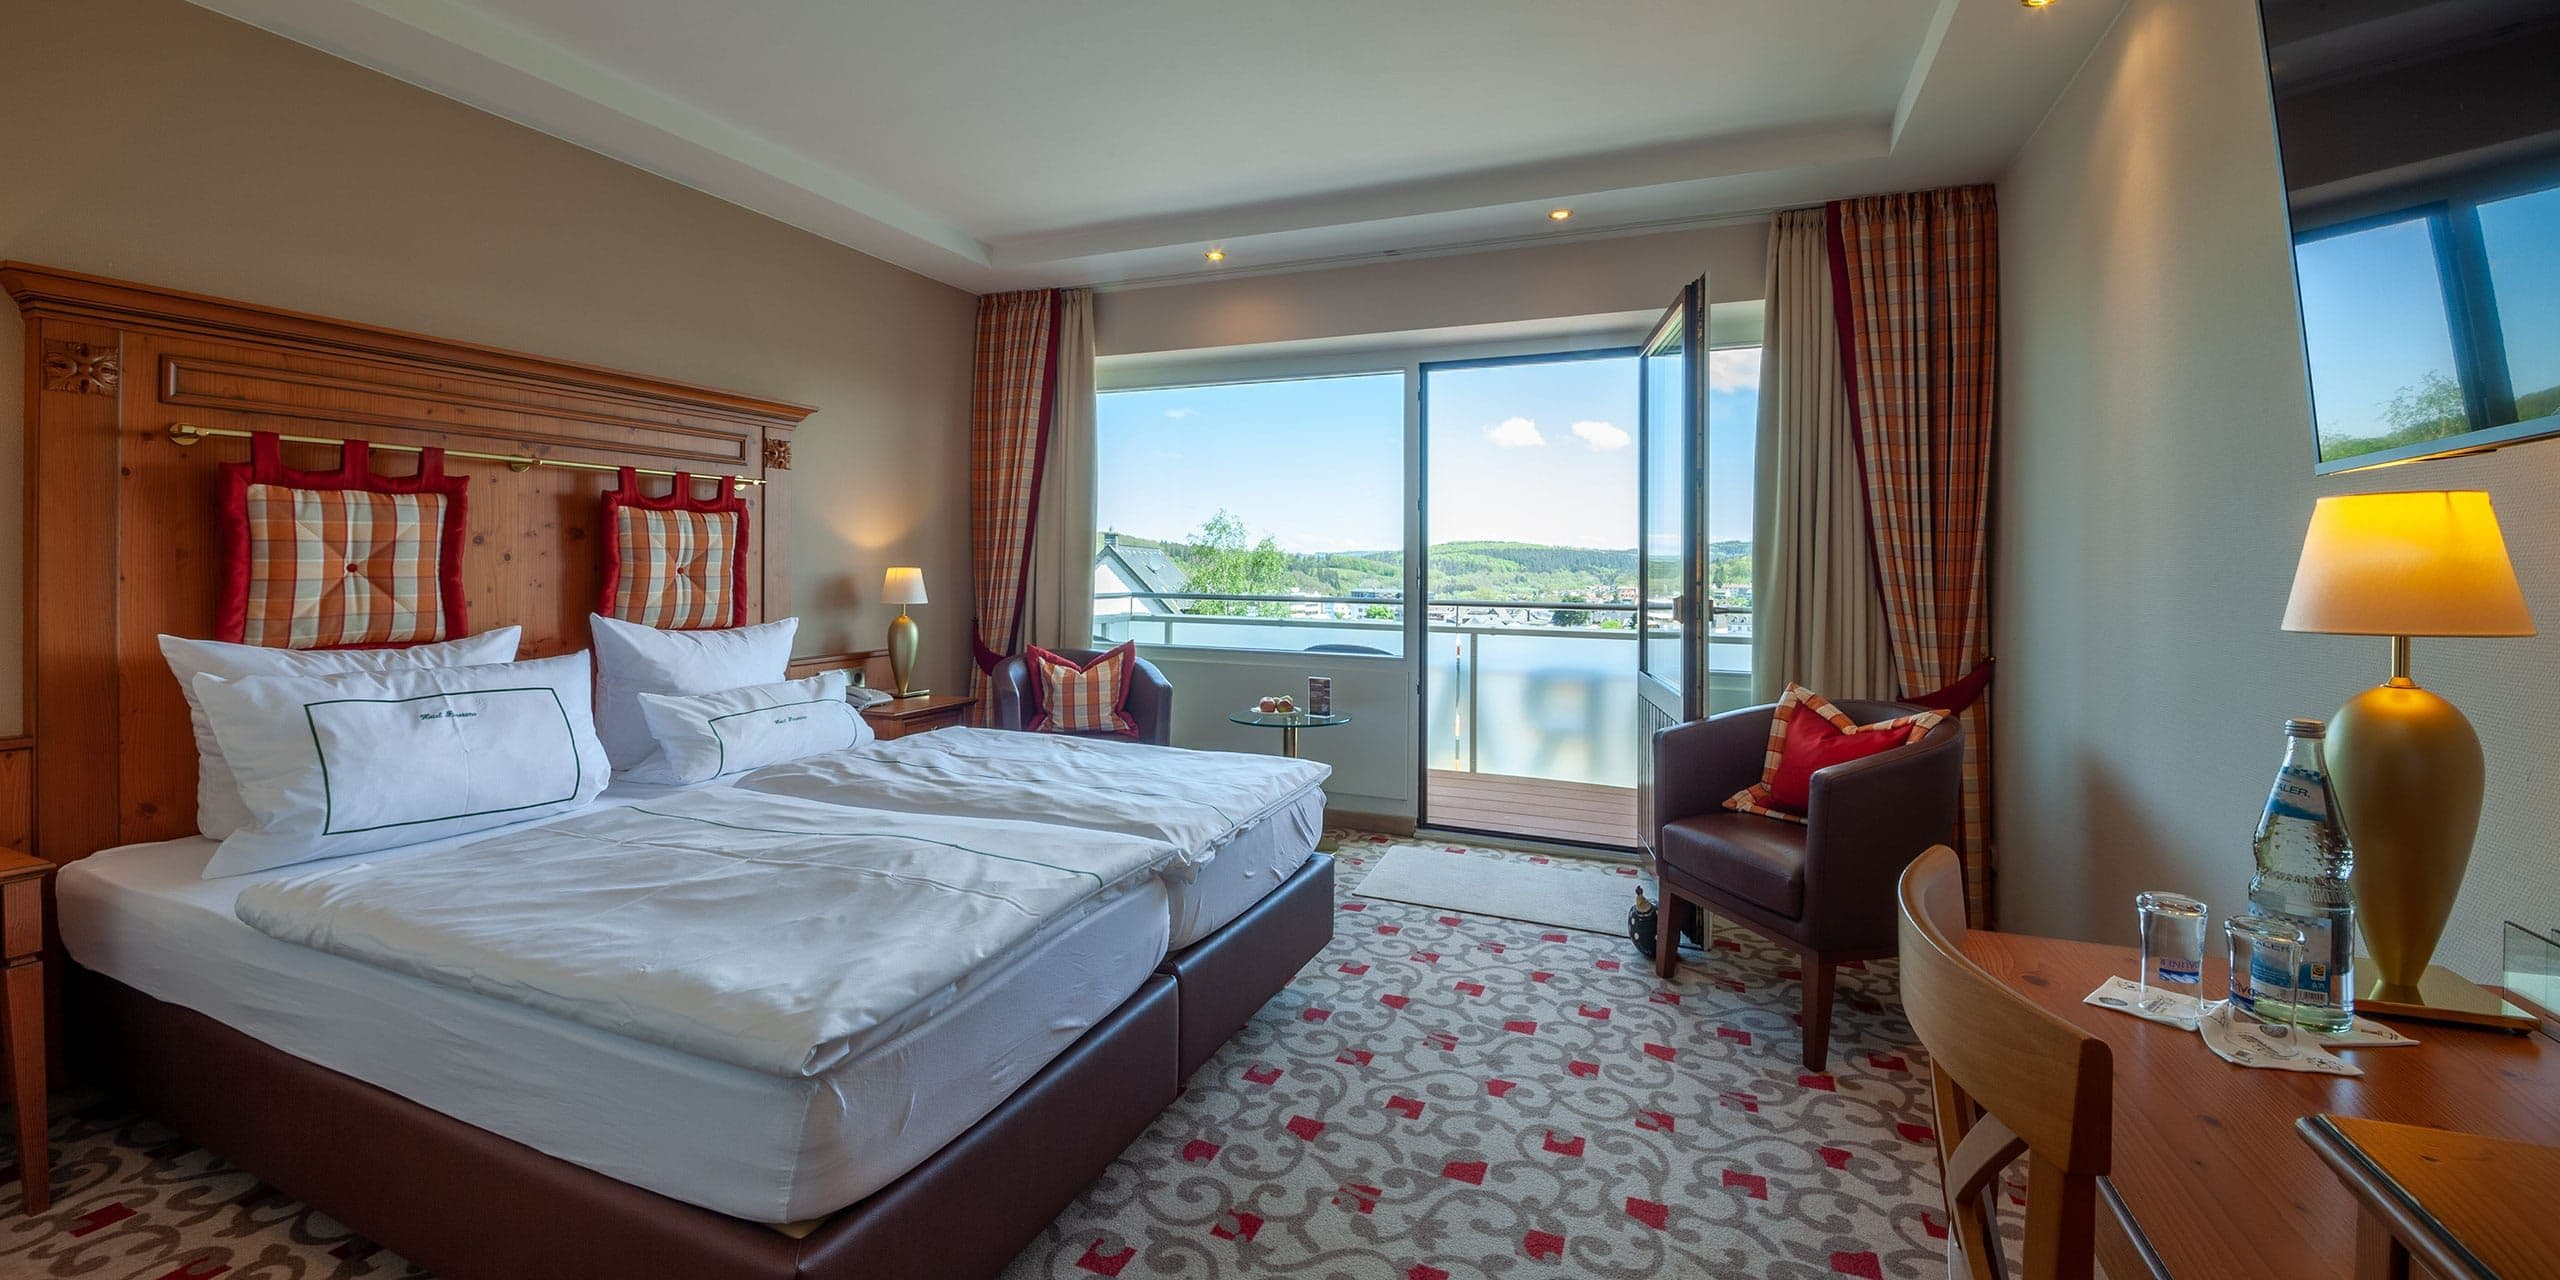 Hotel Zimmer mit Panorama Blick auf Daun